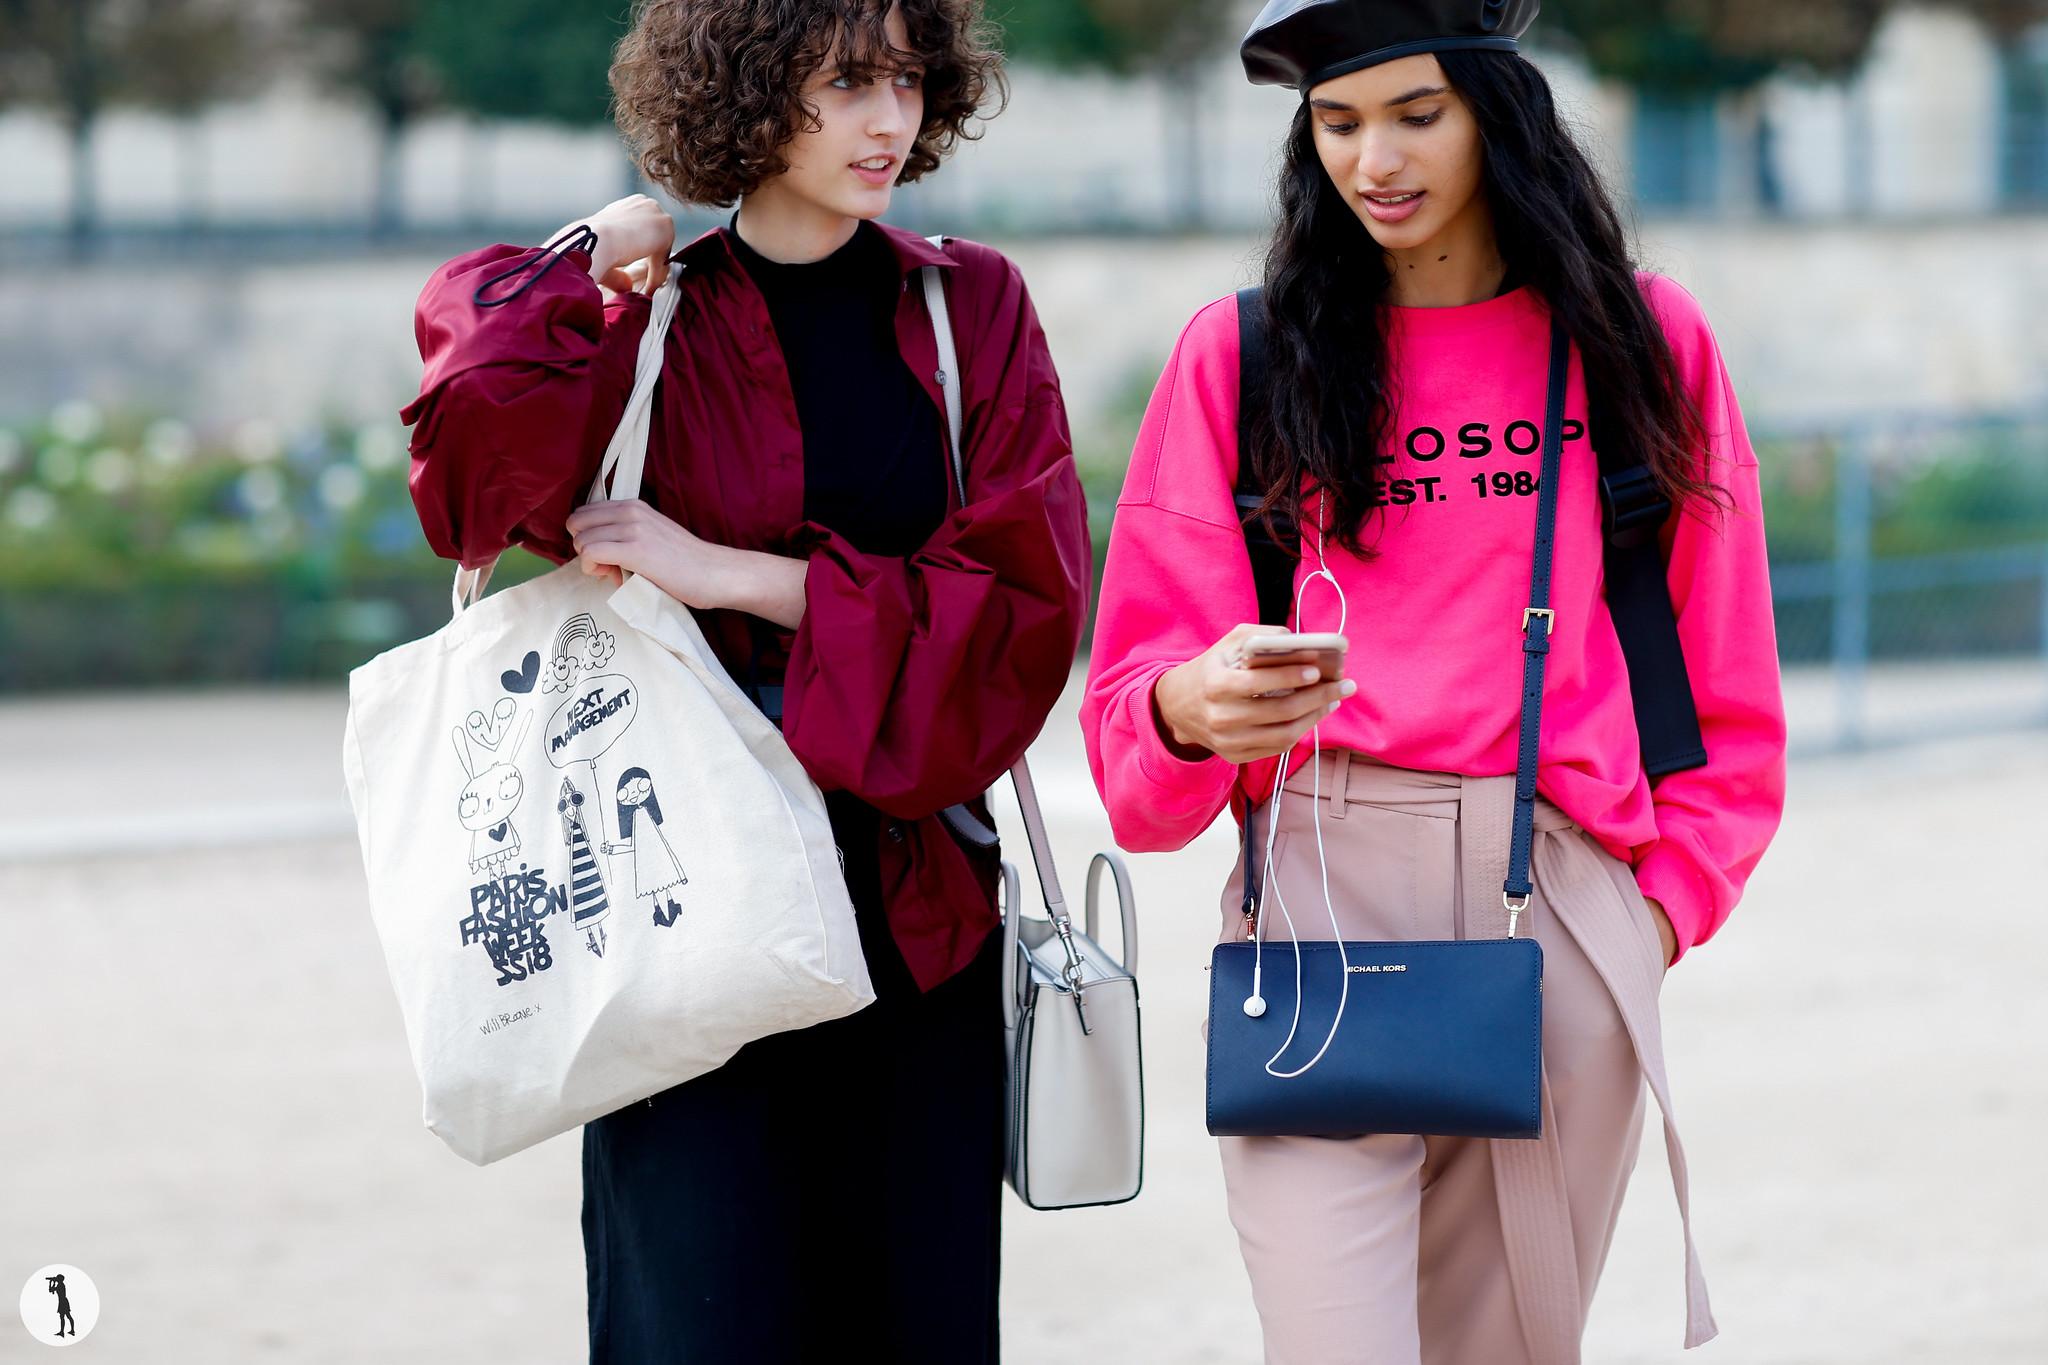 Models Leila Zandonai and Aira Ferreira - Paris Fashion Week SS18 (1)